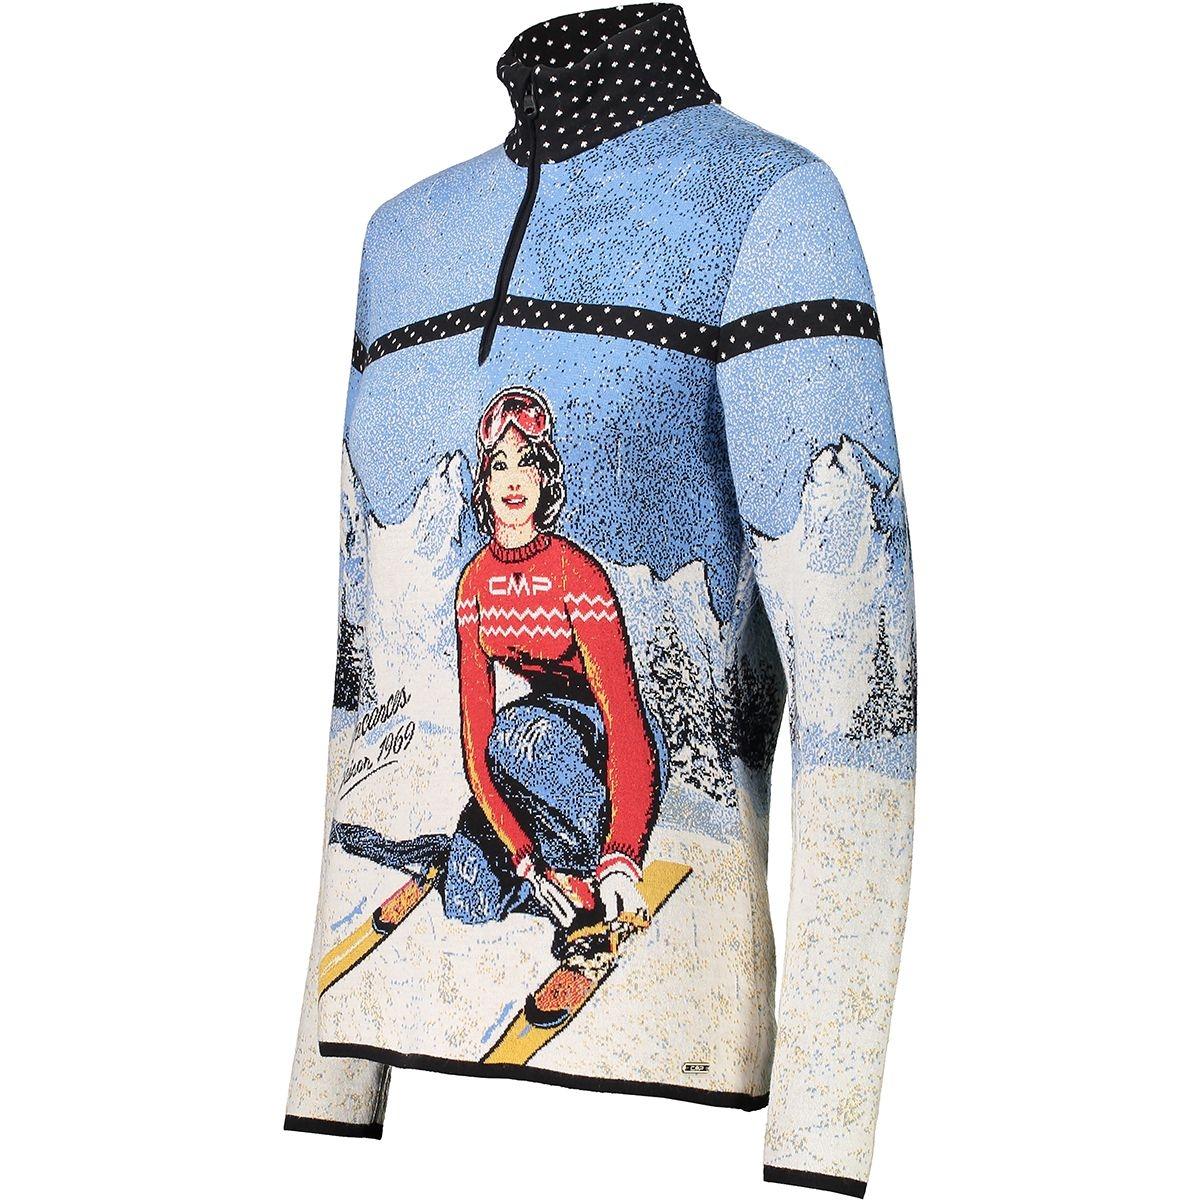 CMP Damen Knitted Print Pullover 7H96930 blau-weiß-rot